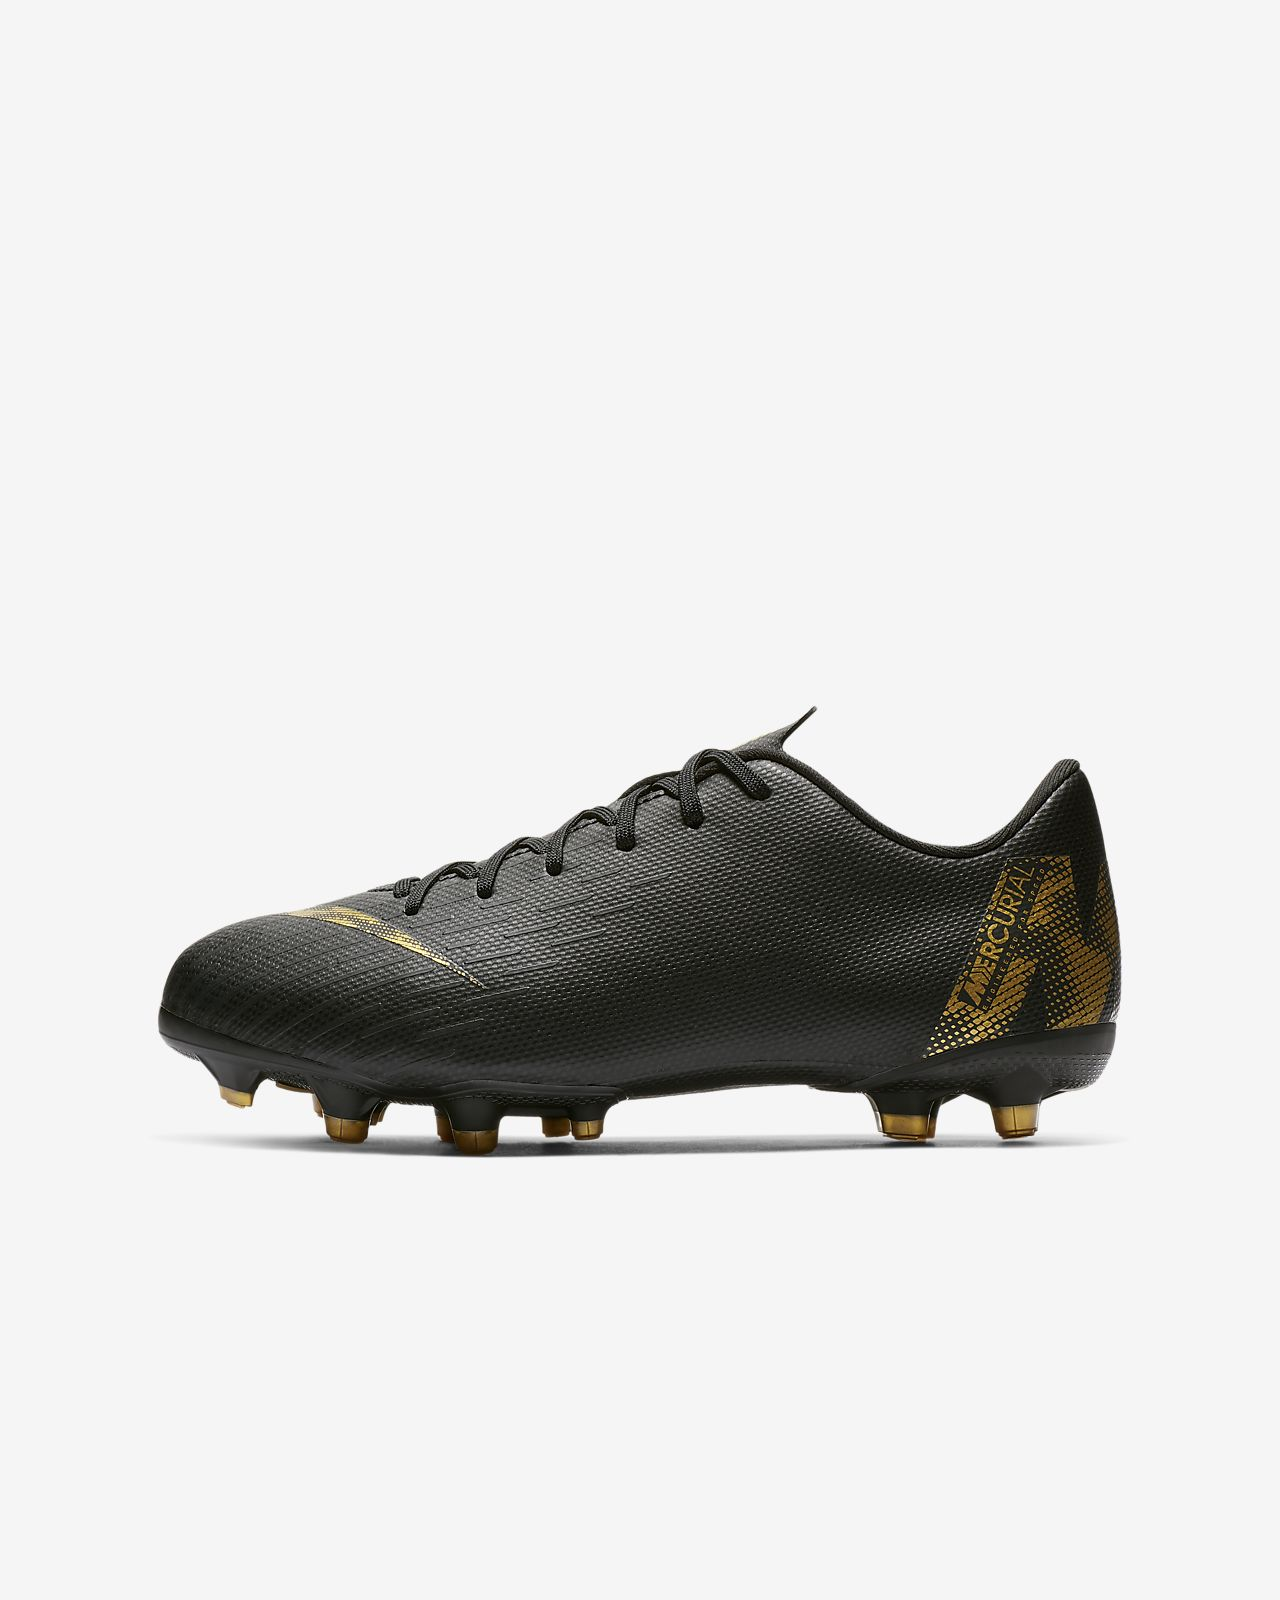 designer fashion 46522 559c3 ... Scarpa da calcio multiterreno Nike Jr. Mercurial Vapor XII Academy -  Bambini/Ragazzi